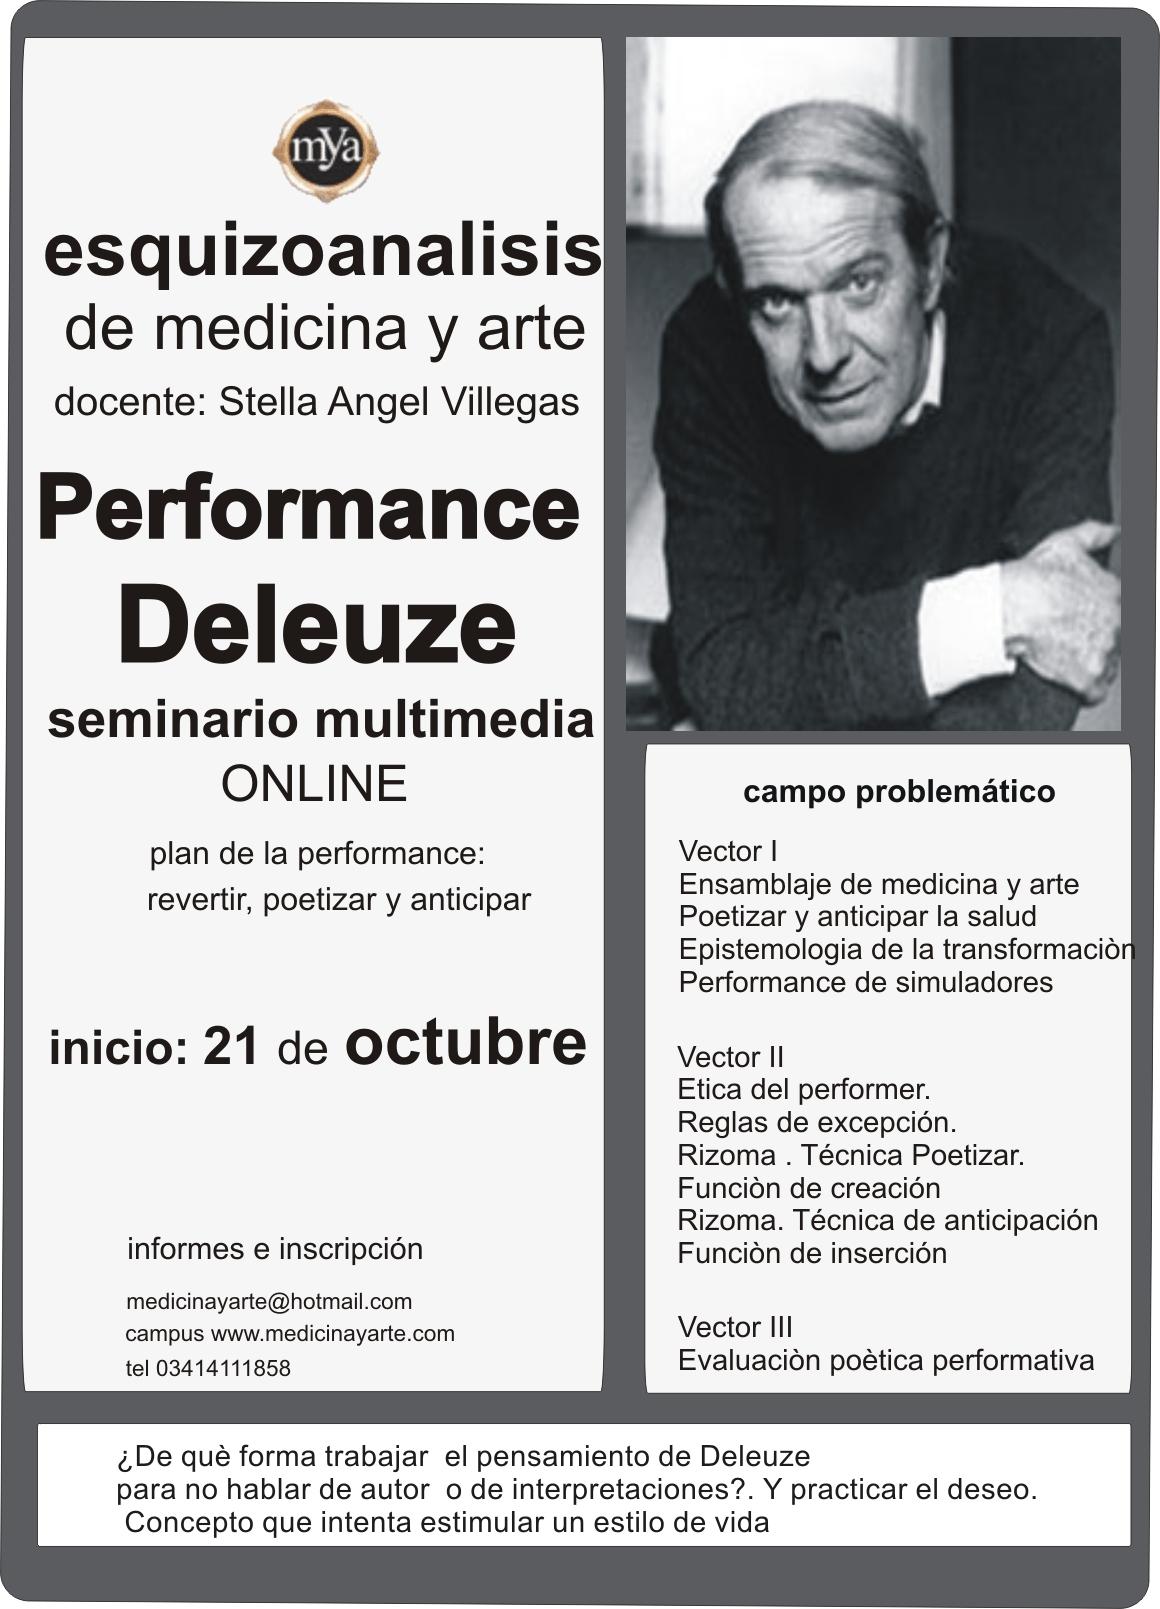 http://medicinayarte.com/img/afiche_performance_deleuze_octubre_2013_2.jpg